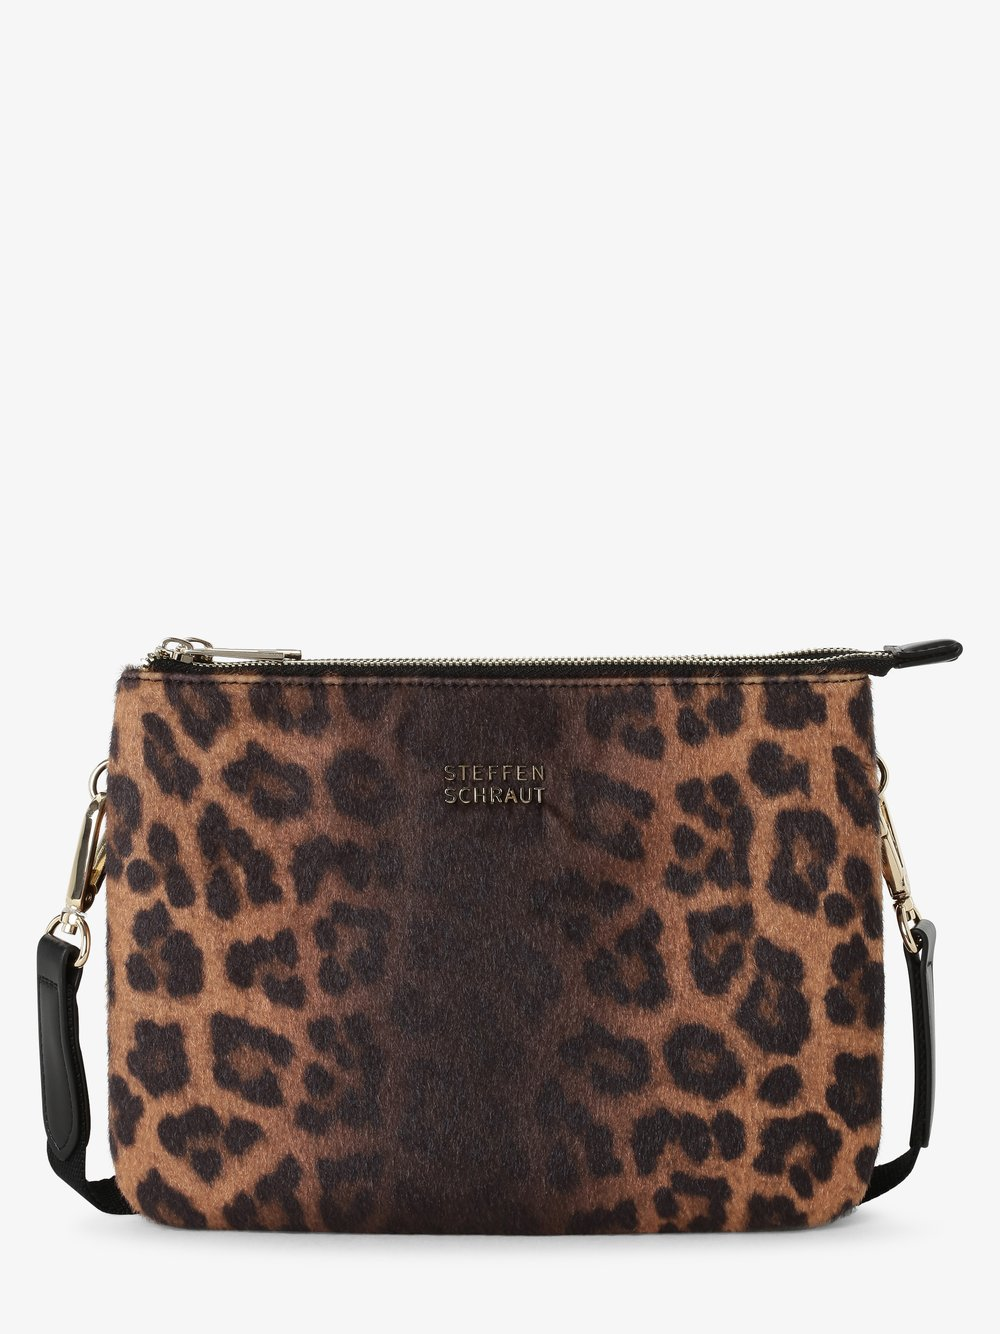 STEFFEN SCHRAUT – Damska torebka na ramię, czarny Van Graaf 483014-0001-00000